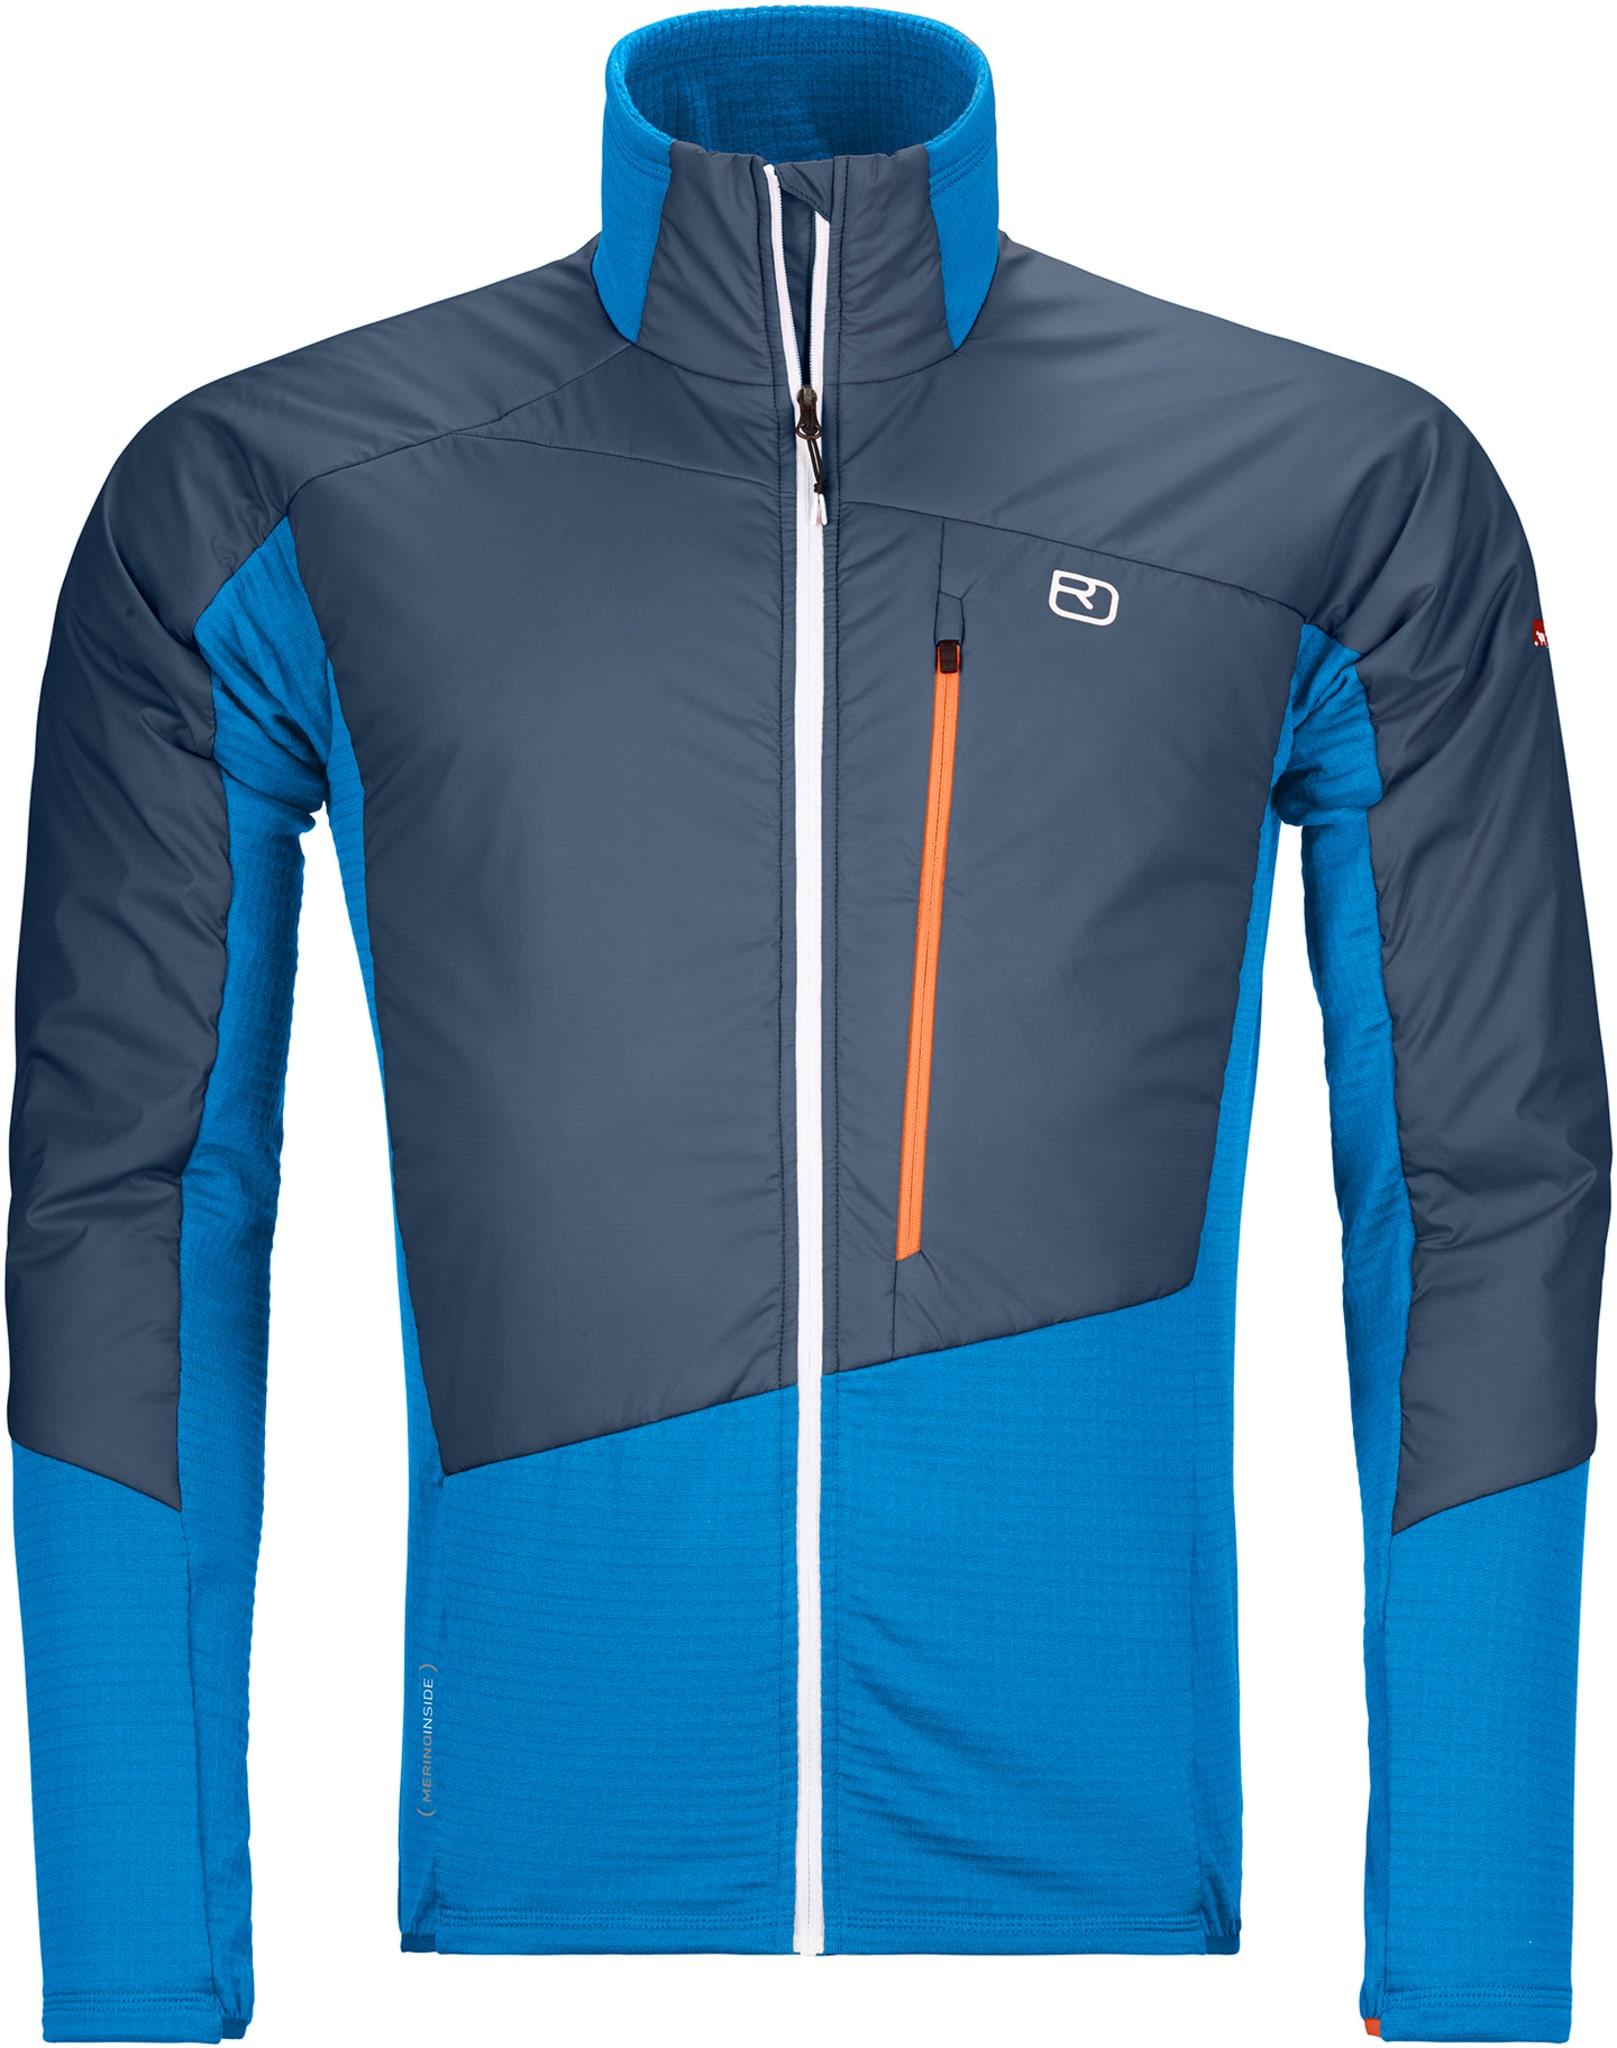 Westalpen Hybrid jacket Ms